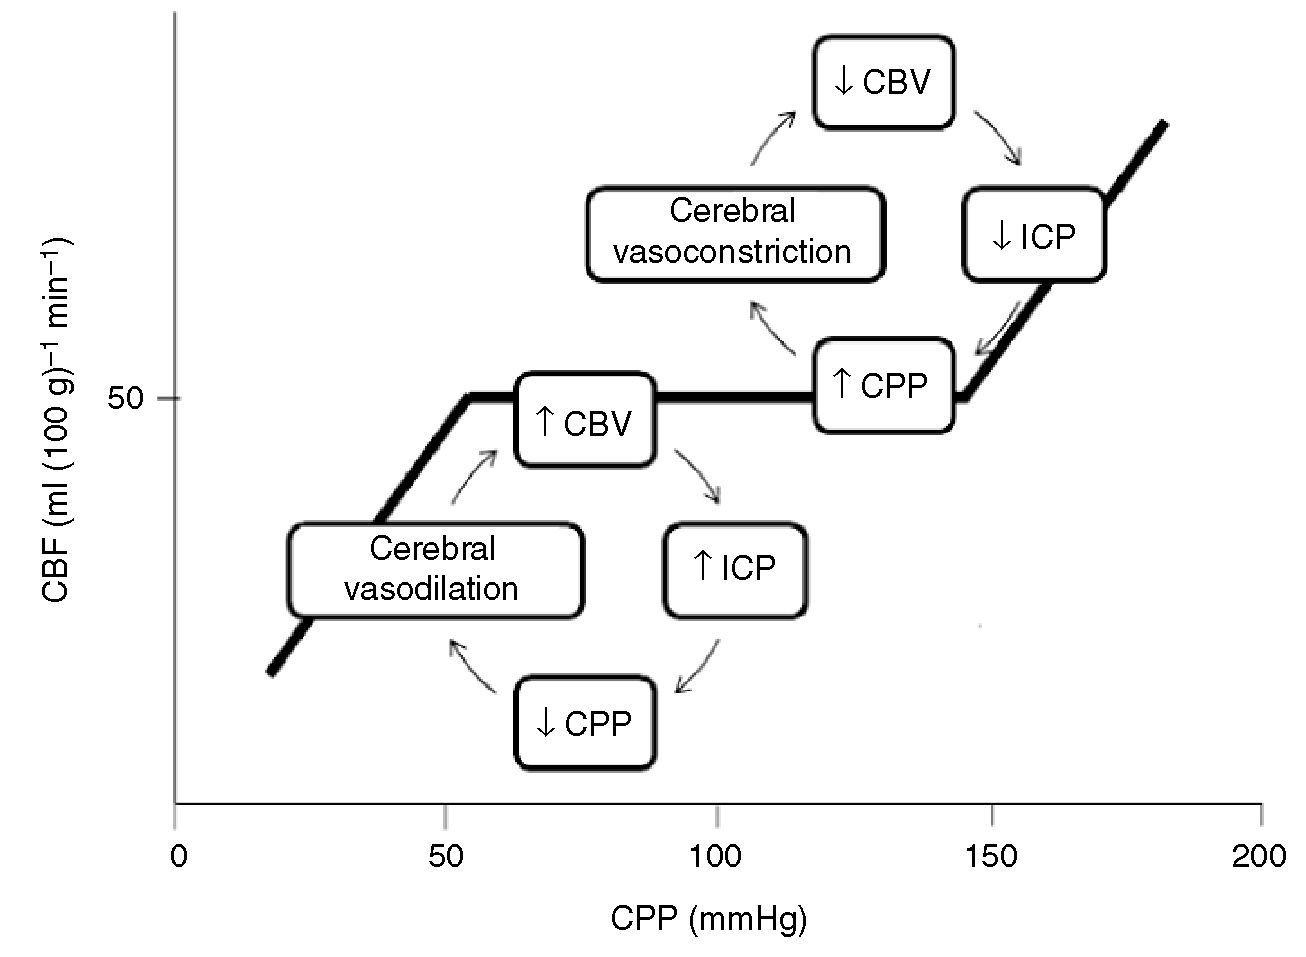 CPP ICP Google Search Google search, Nurse, Search